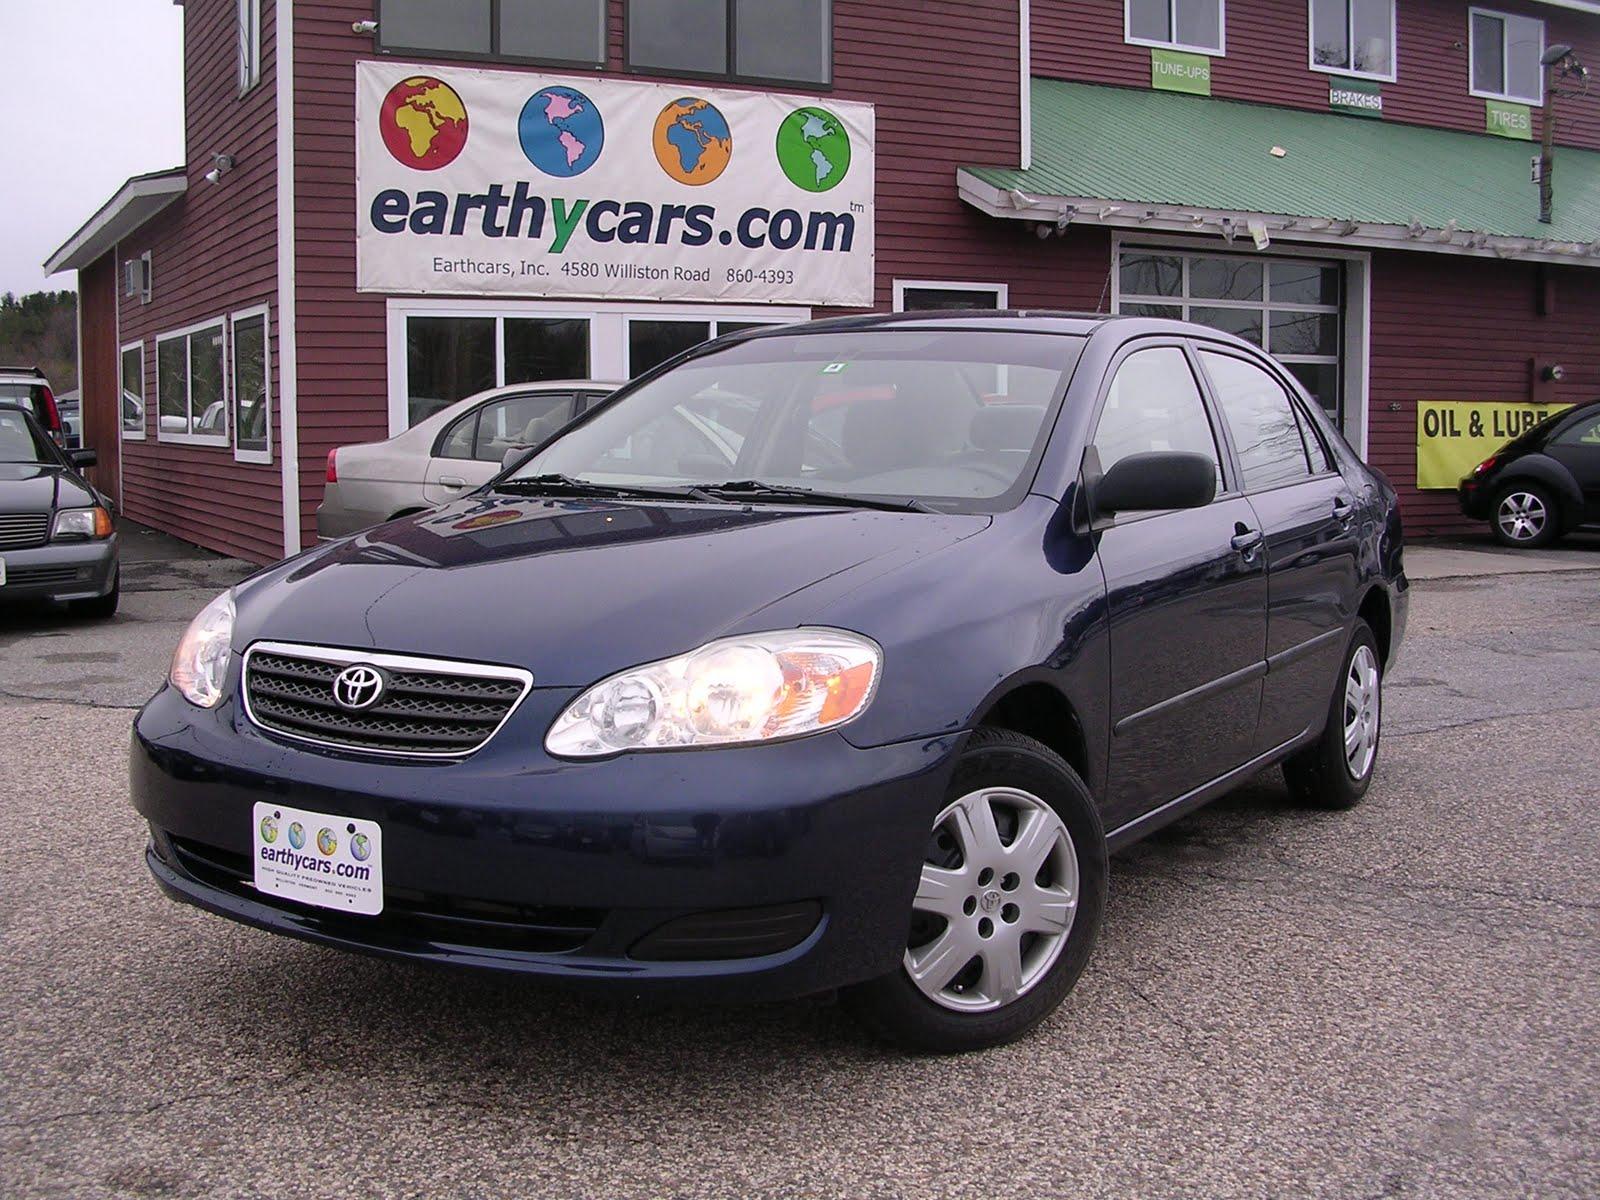 EARTHY CAR OF THE WEEK: 2005 Blue Toyota Corolla